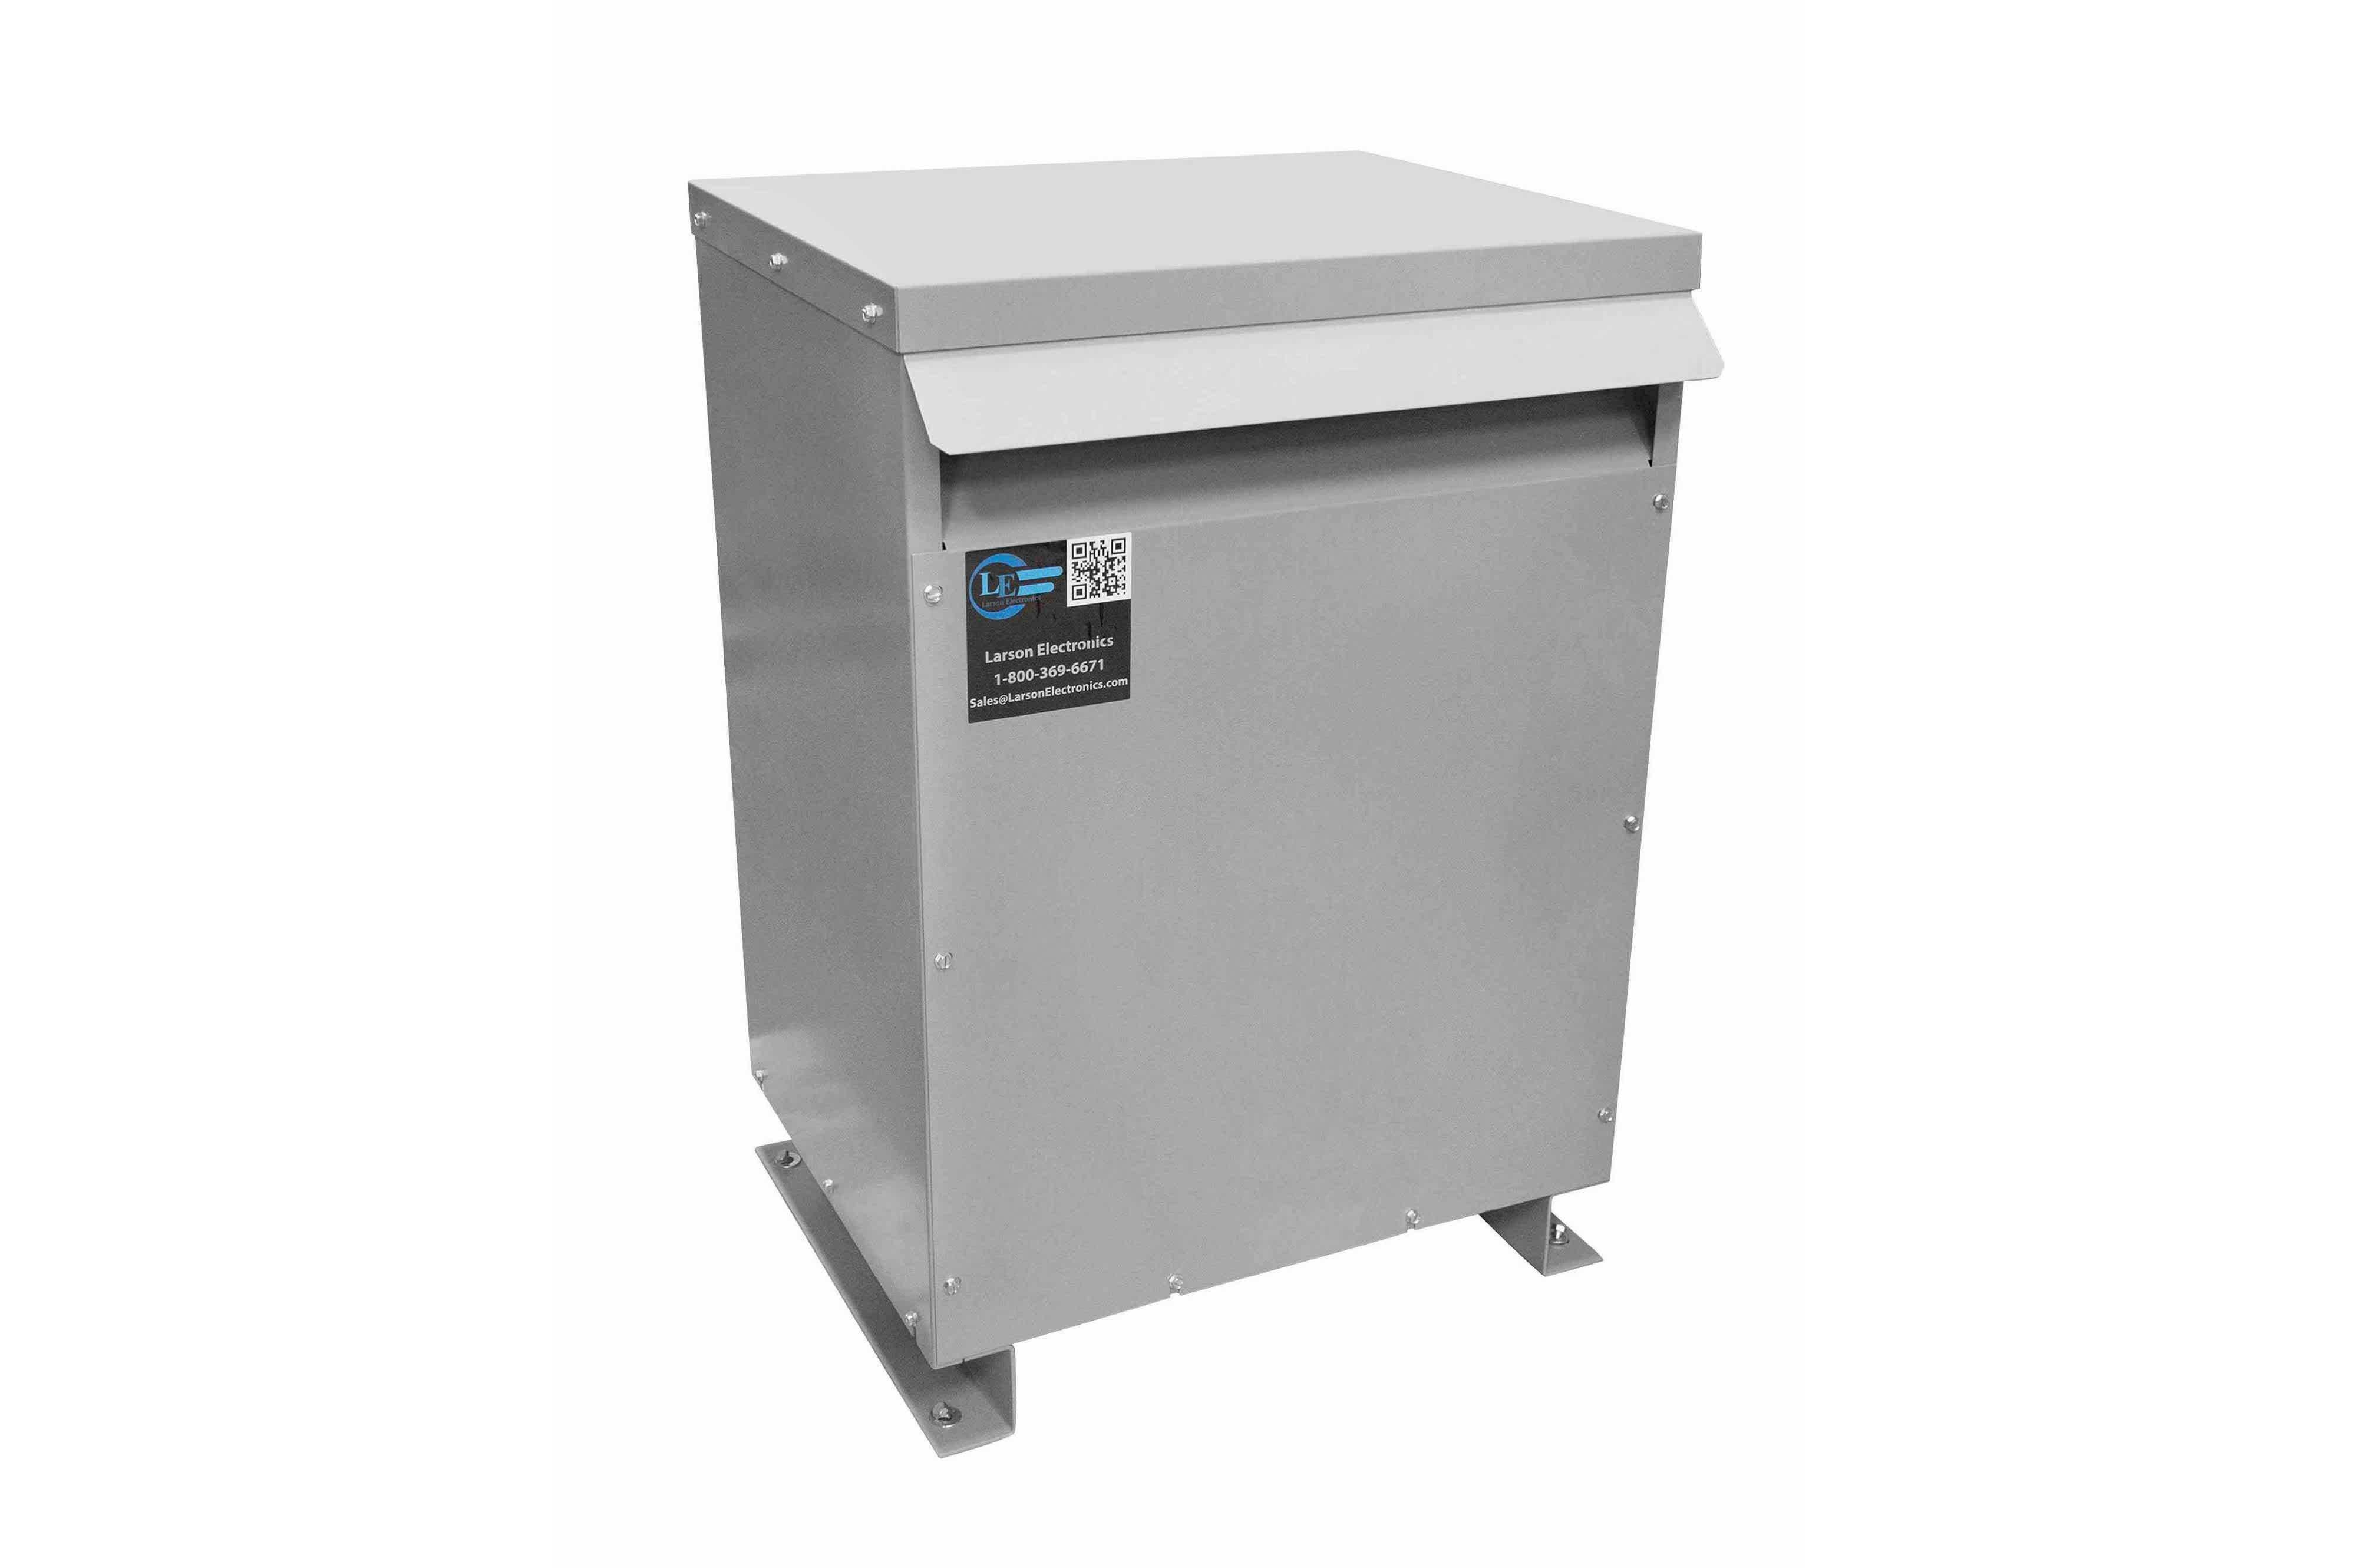 75 kVA 3PH Isolation Transformer, 575V Wye Primary, 240V/120 Delta Secondary, N3R, Ventilated, 60 Hz